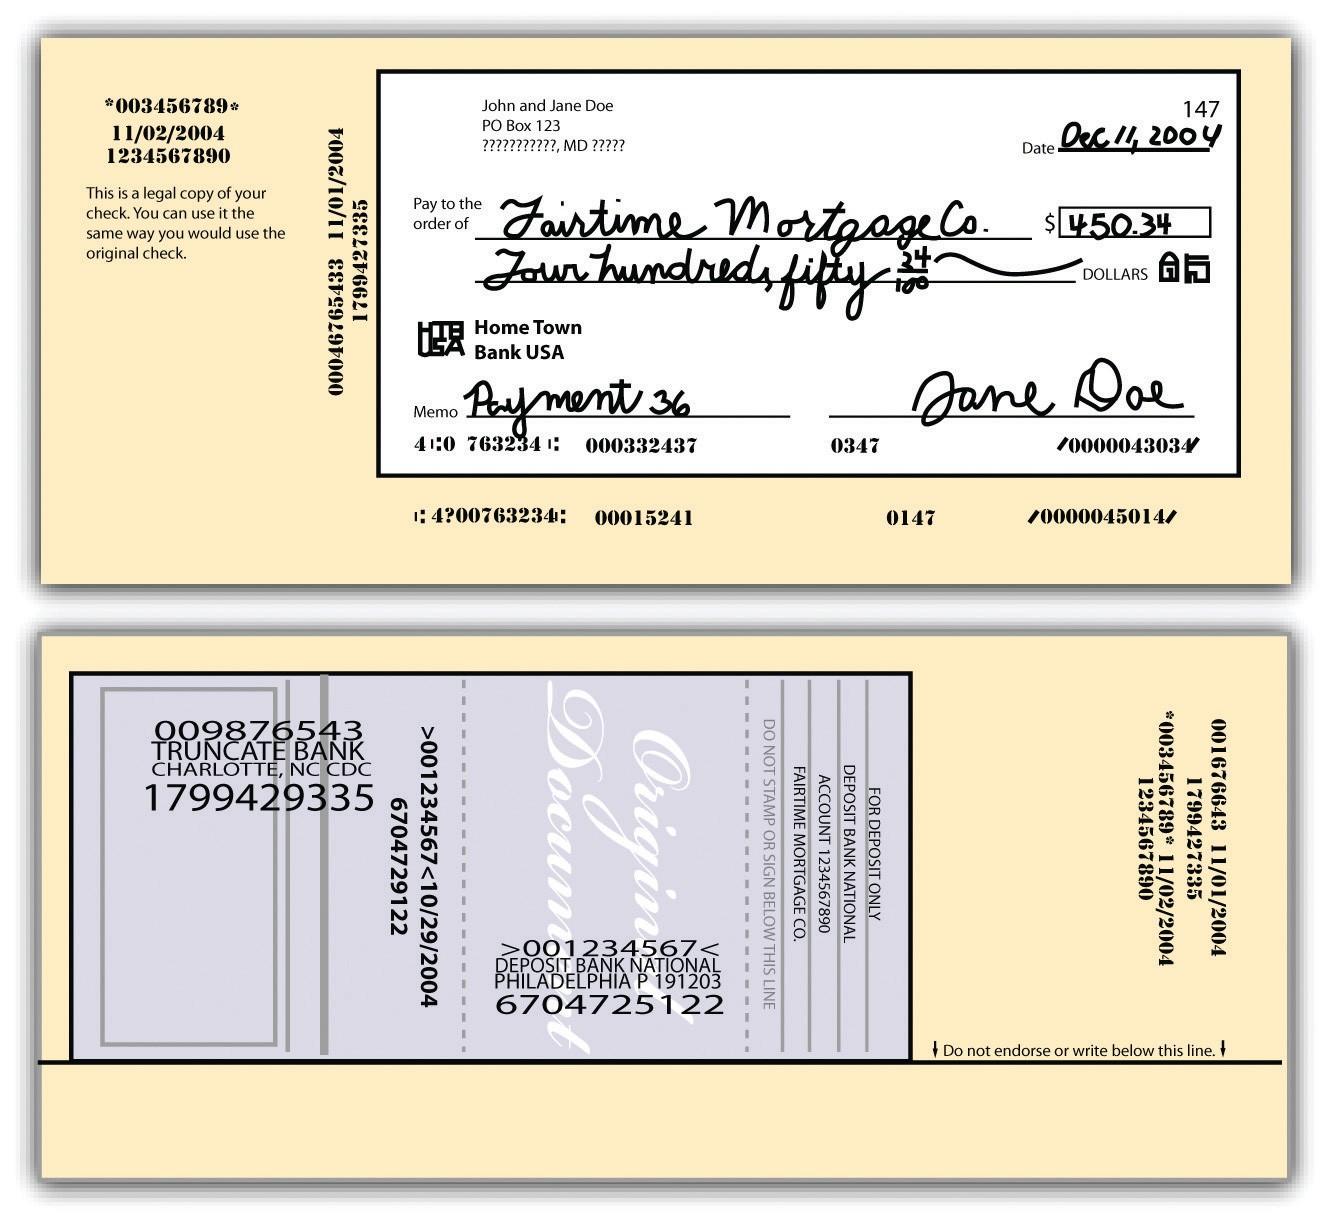 bank of america bank check endorsement  Legal Aspects of Banking - bank of america bank check endorsement